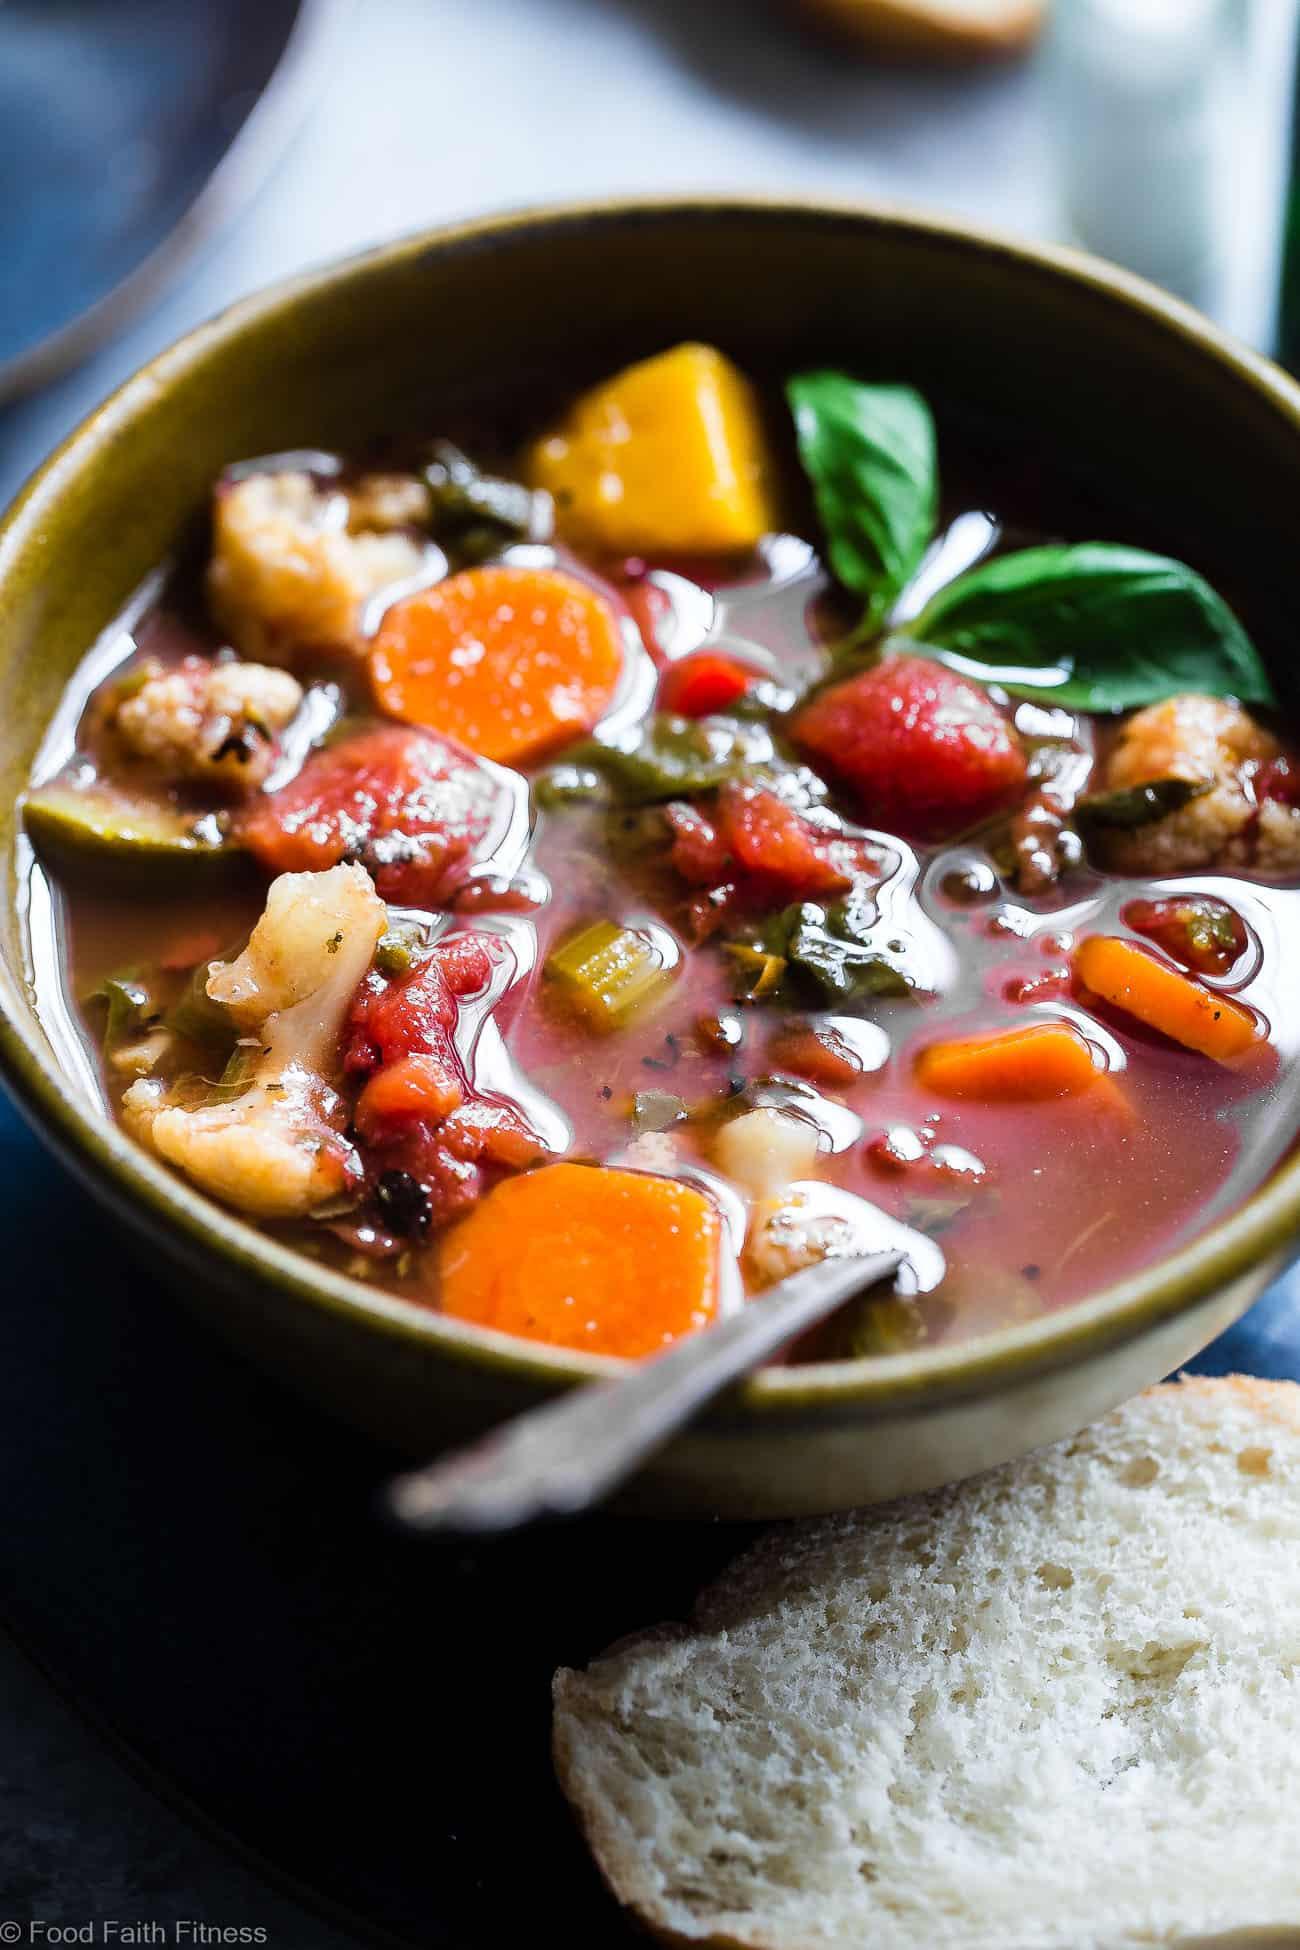 Crockpot Vegan Recipes  Easy Homemade Crockpot Ve able Soup